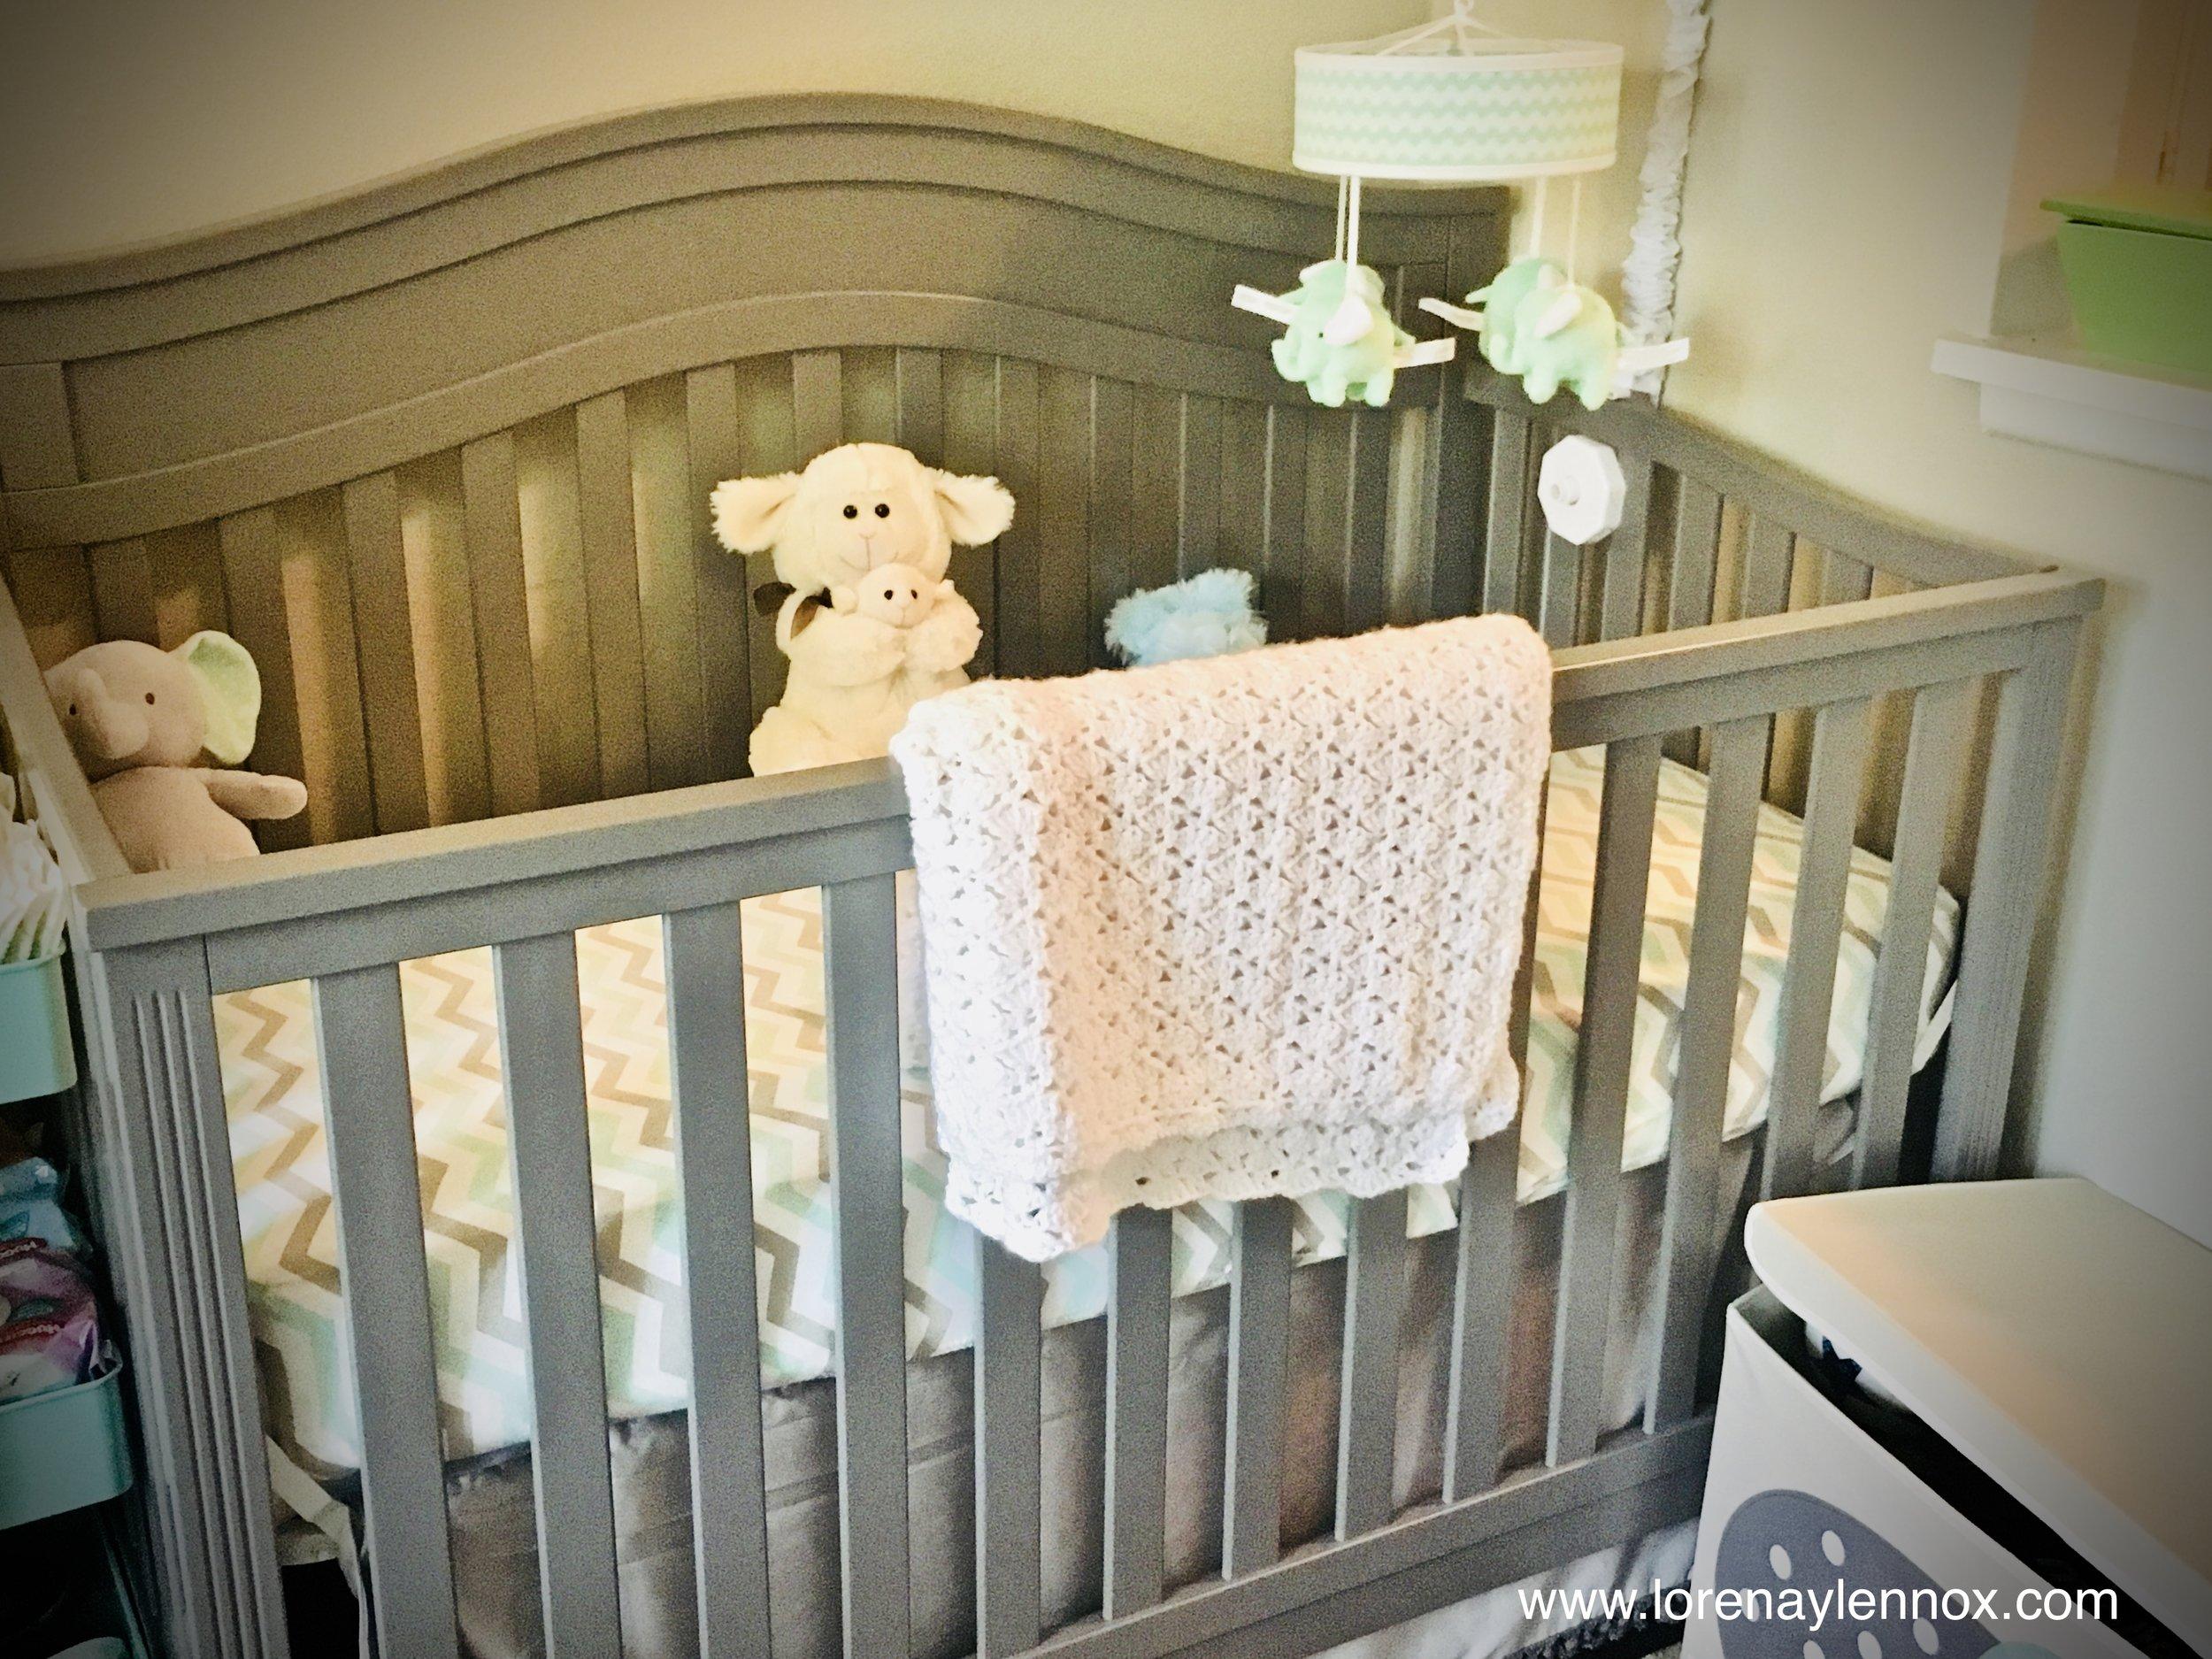 Nursery Baby Registry Essentials. Mint and Grey Nursery Theme.